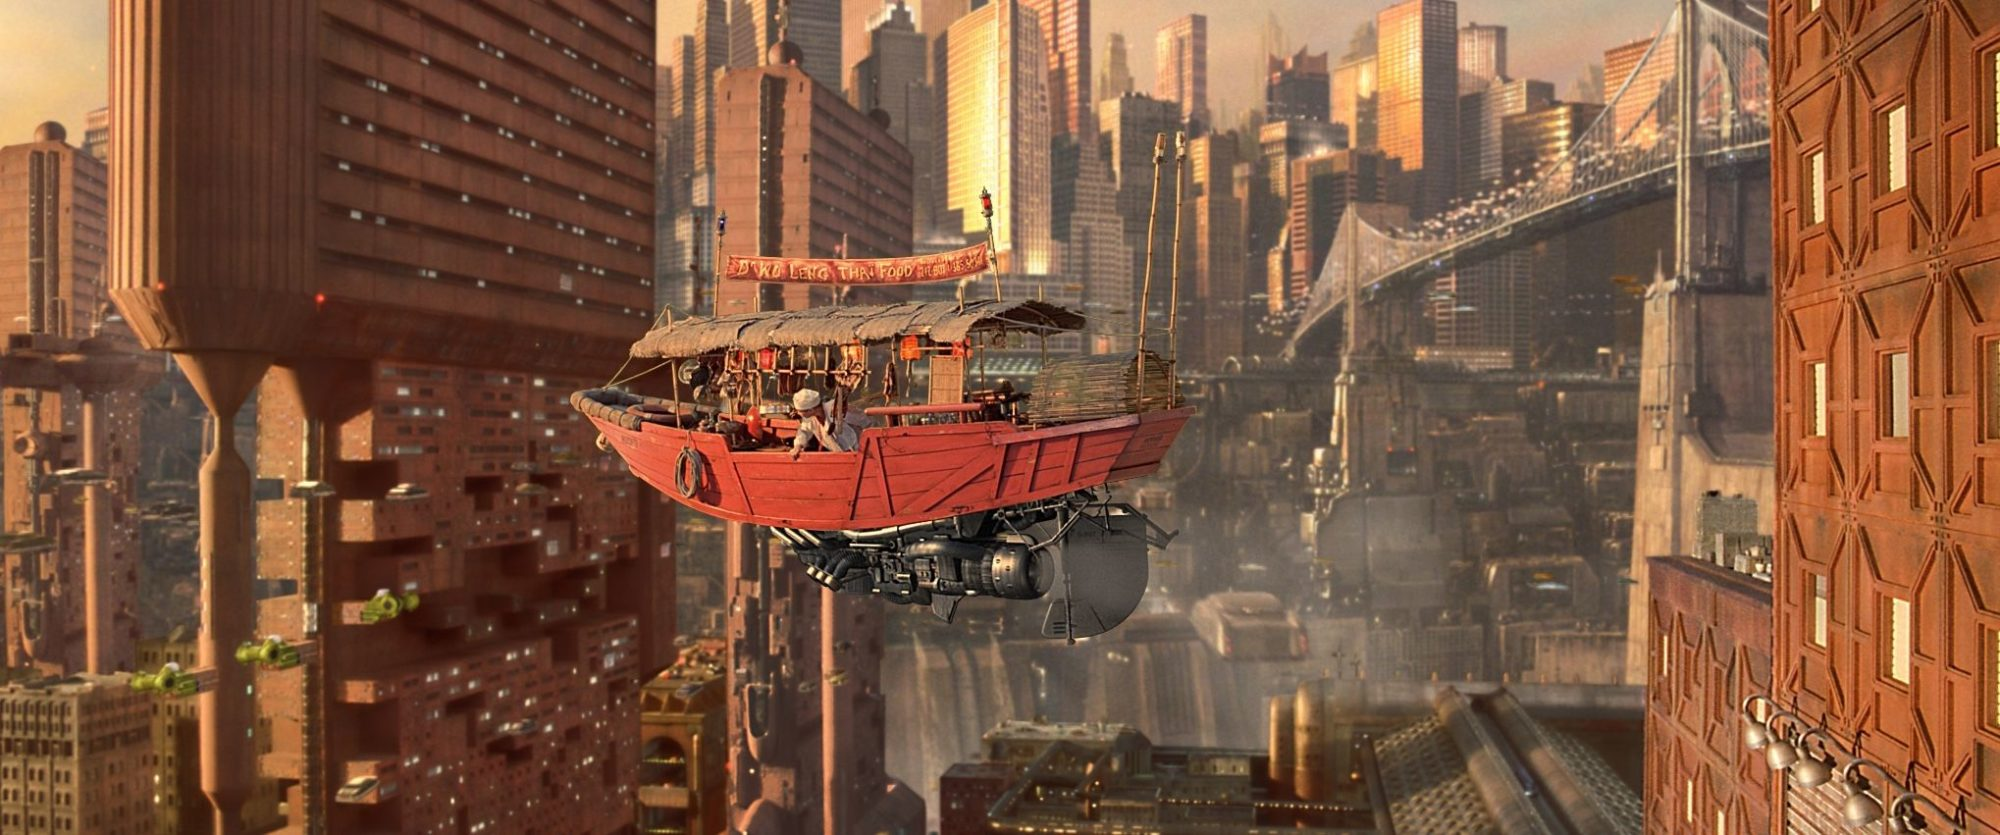 The Fifth Element bright cityscape